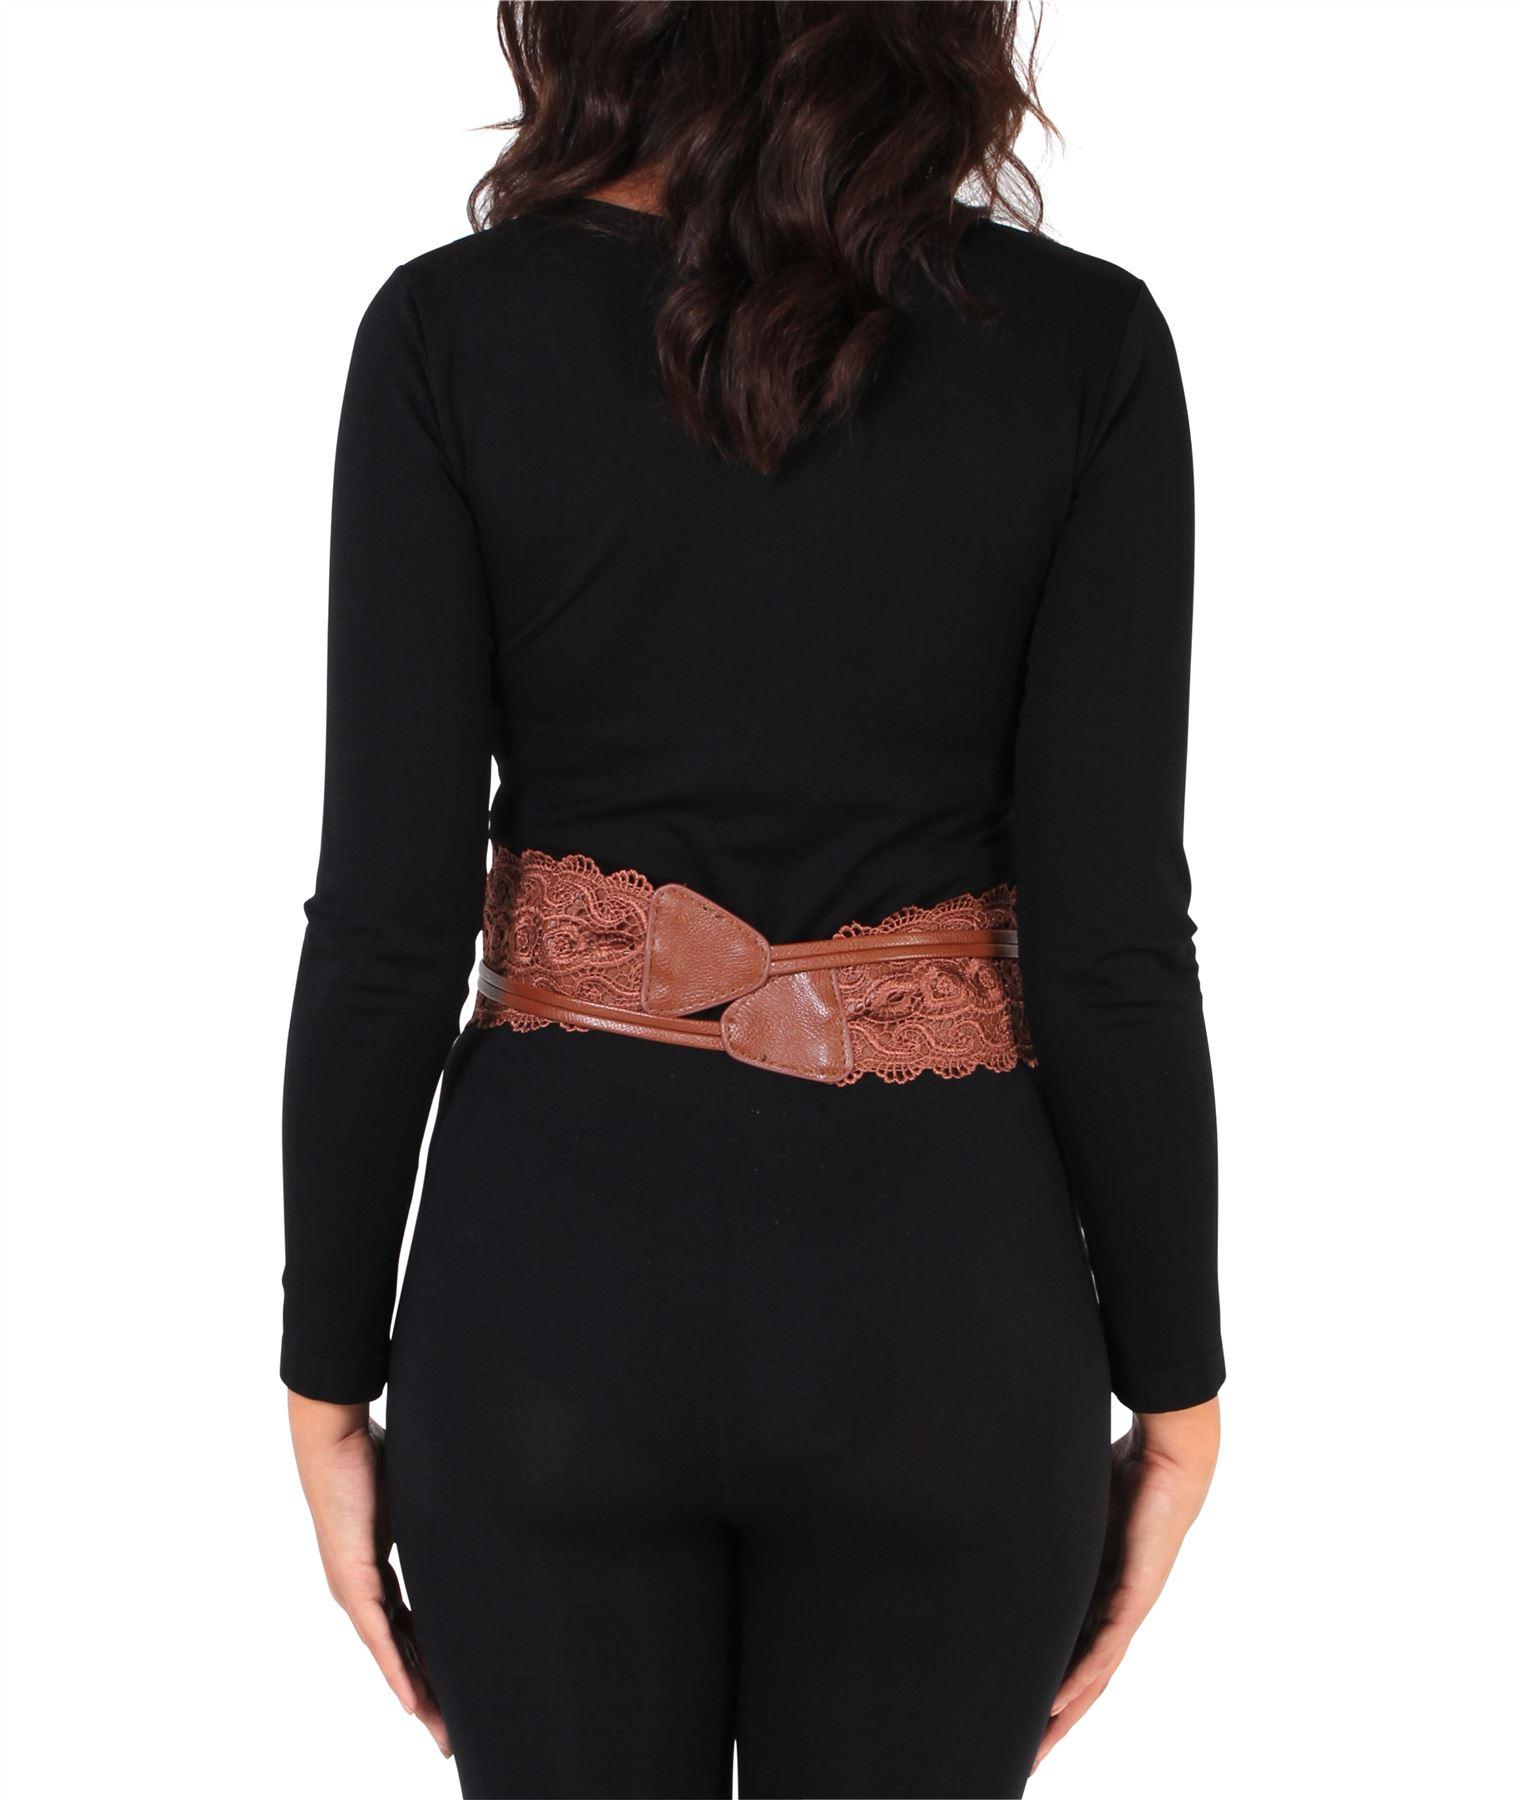 thumbnail 13 - Womens-Ladies-Wide-Waist-Belt-Floral-Waistband-Pattern-Band-Crochet-Lace-Corset